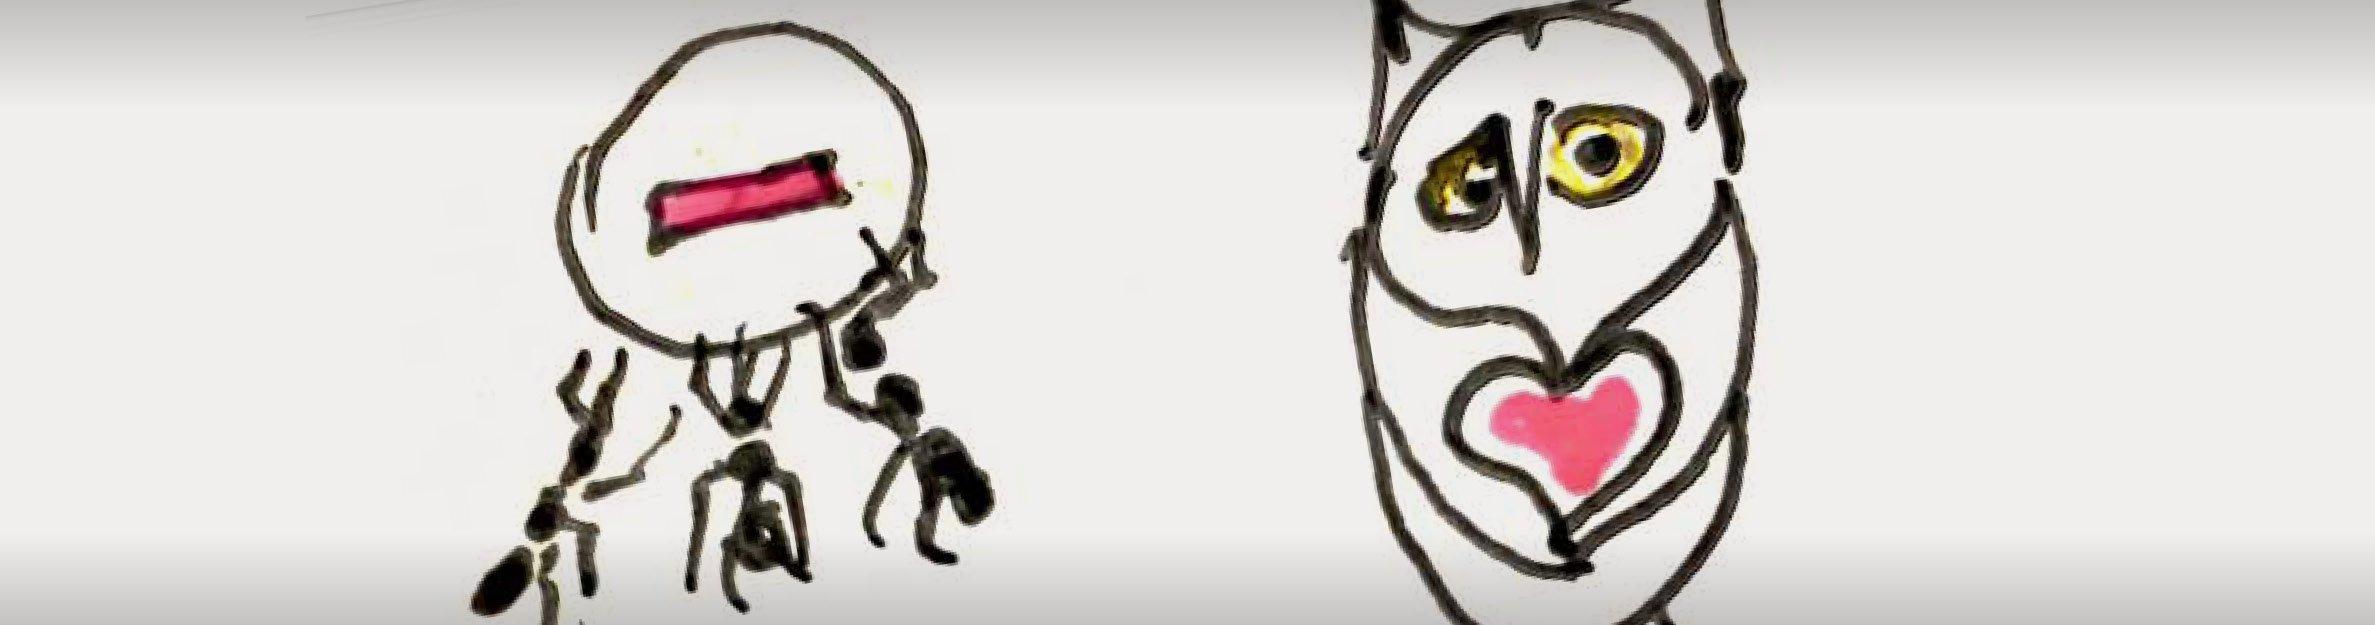 PNP-ants-vs-owl